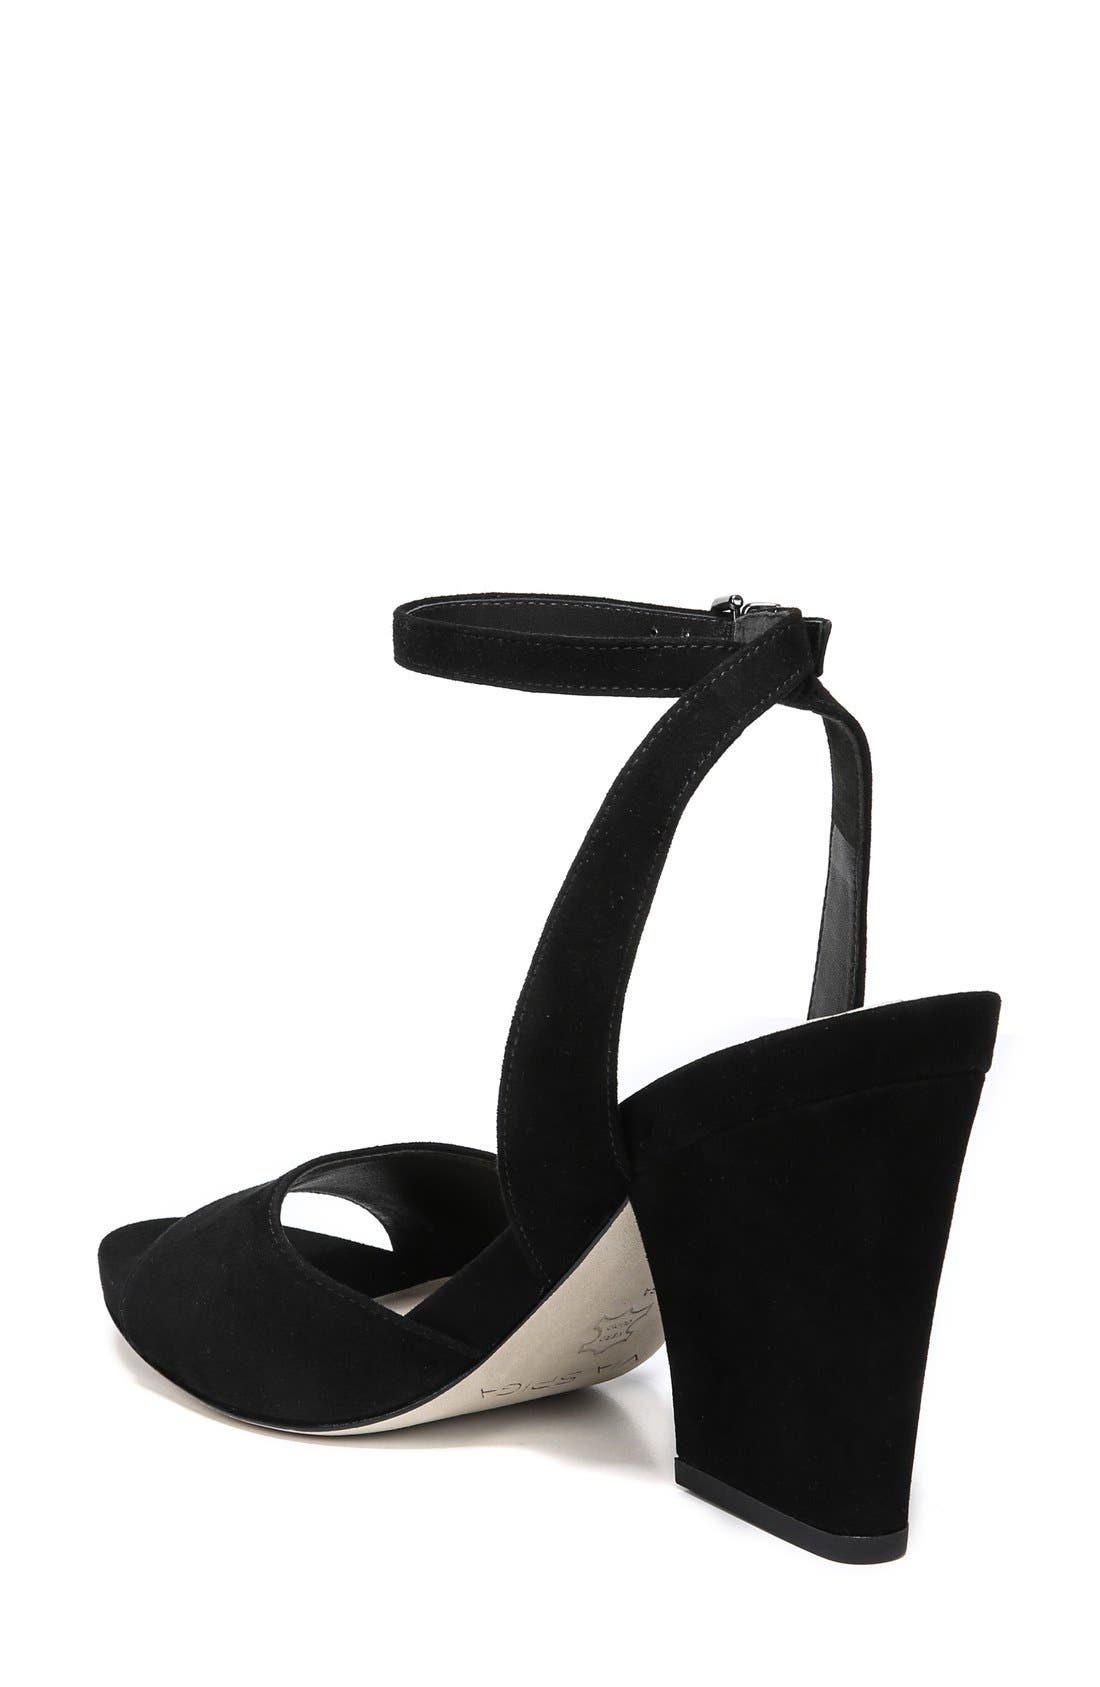 'Piper' Ankle Strap Sandal,                             Alternate thumbnail 3, color,                             003